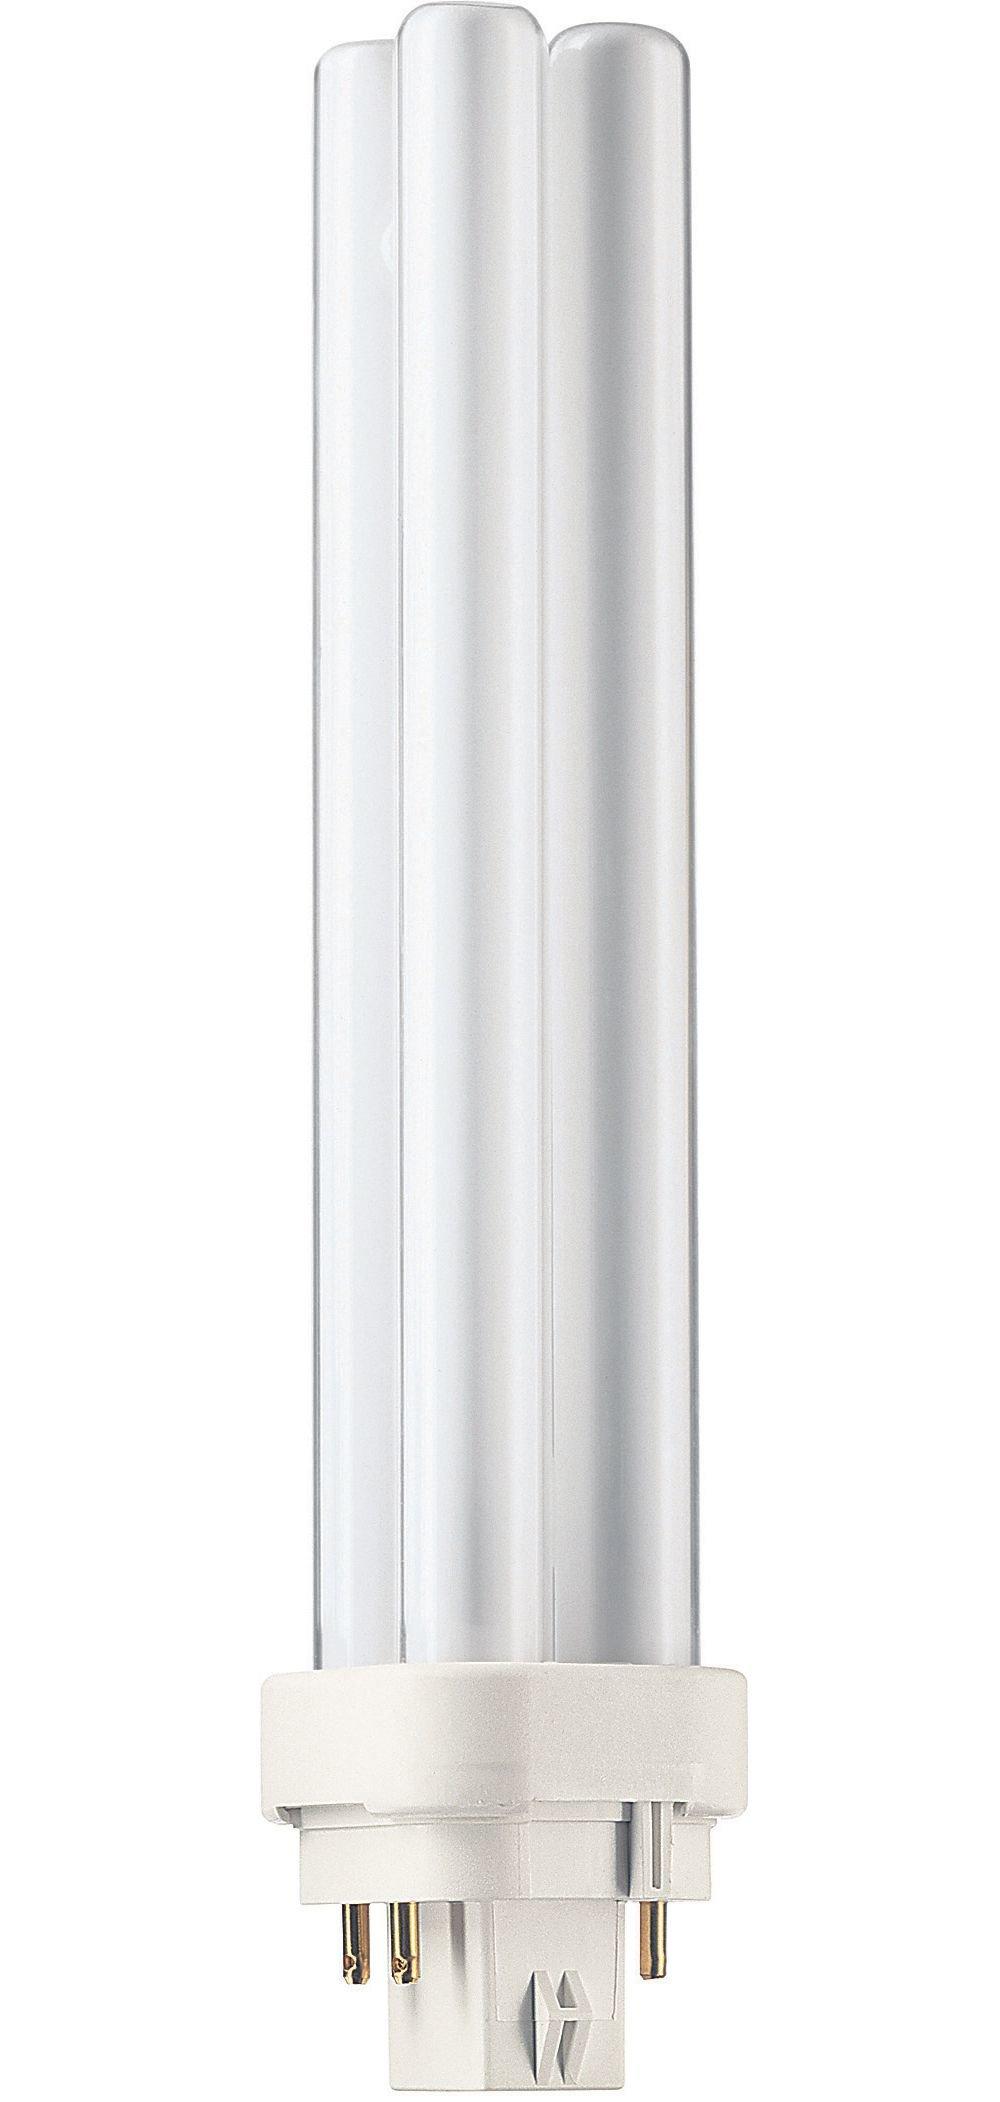 Philips 230425 Energy Saver Compact Fluorescent Non-Integrated 26-Watt PL-C Soft White 4-Pin Base Light Bulb